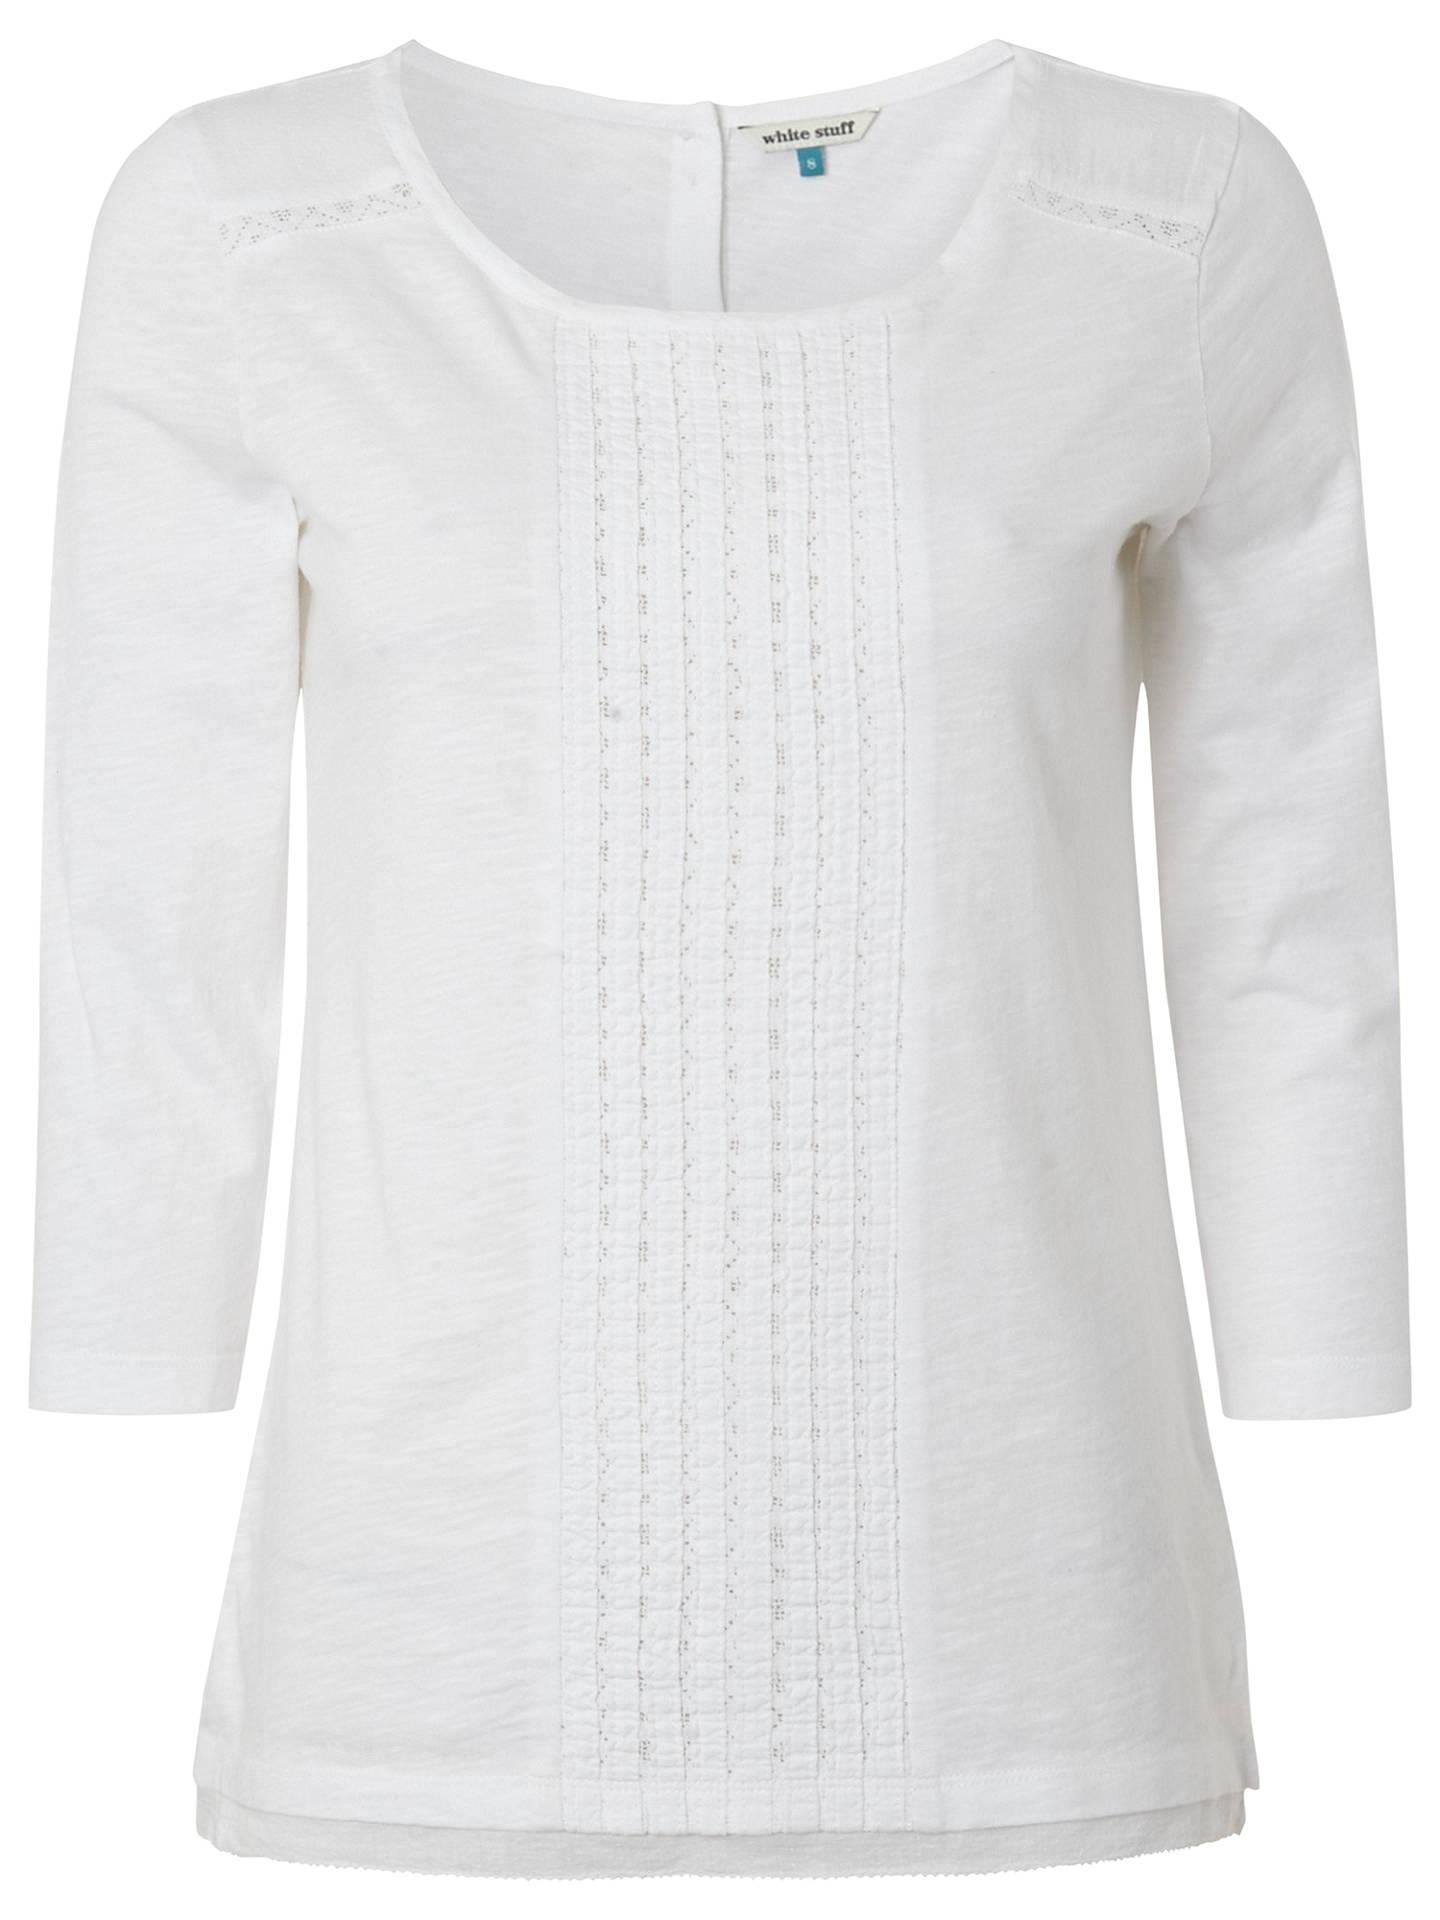 b7d2d967f1885 BuyWhite Stuff Millie T-Shirt